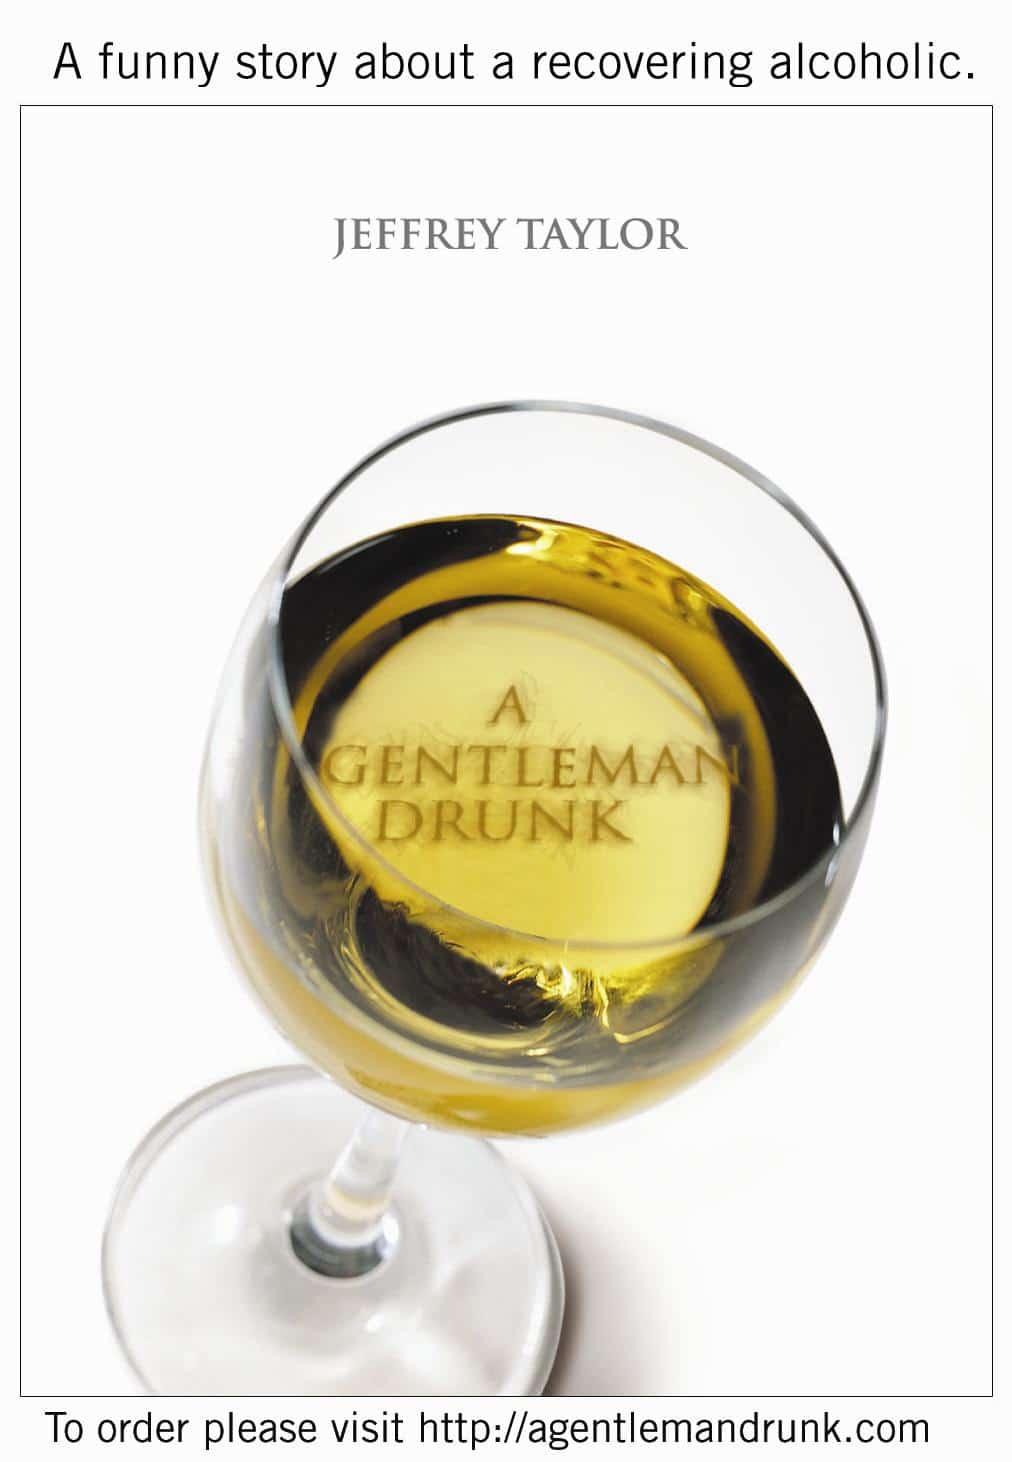 A Gentleman Drunk - Jeffrey Taylor